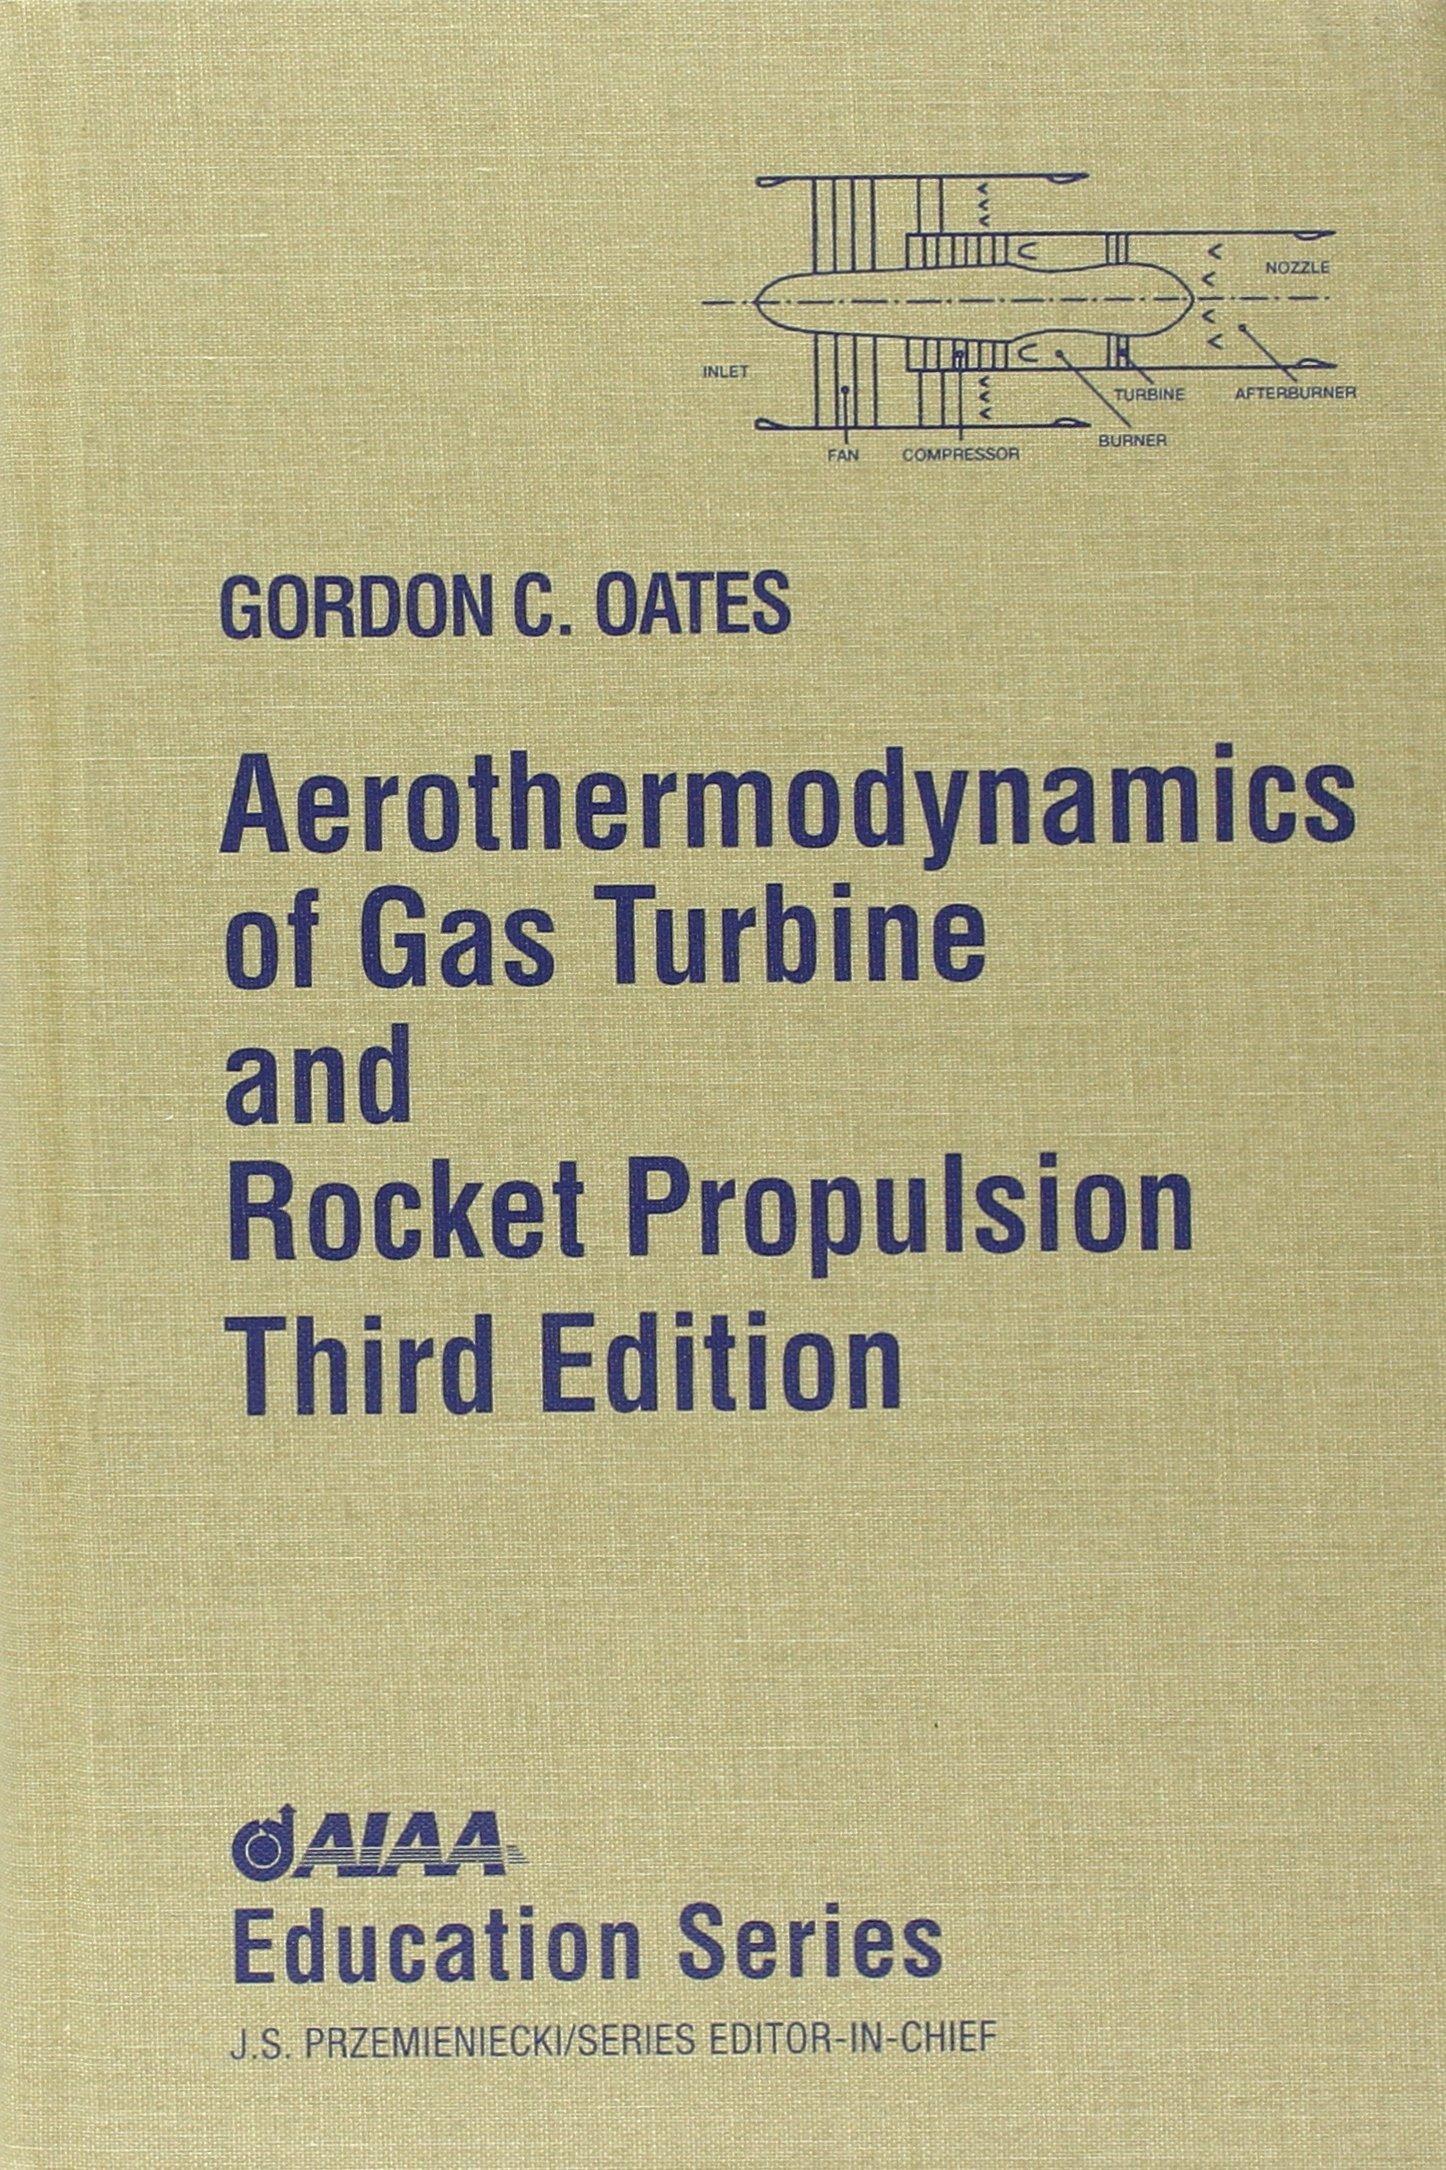 Buy Aerothermodynamics of Gas Turbine and Rocket Propulsion AIAA